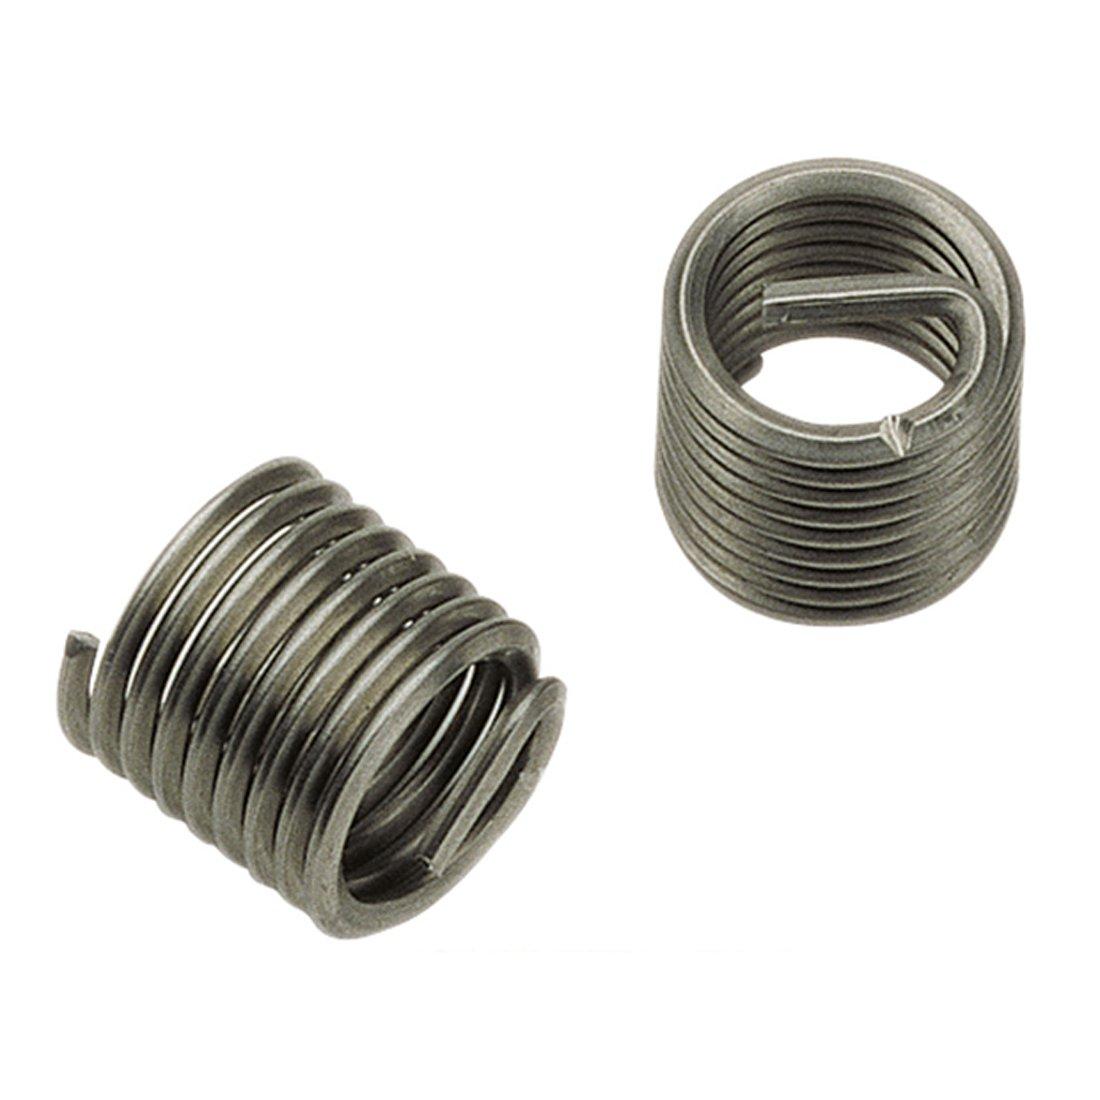 V/ölkel standard Insertos Roscados 07216 de aceros inoxidable libre 10 x 1.25/1,0/D Tipo S DIN 8140